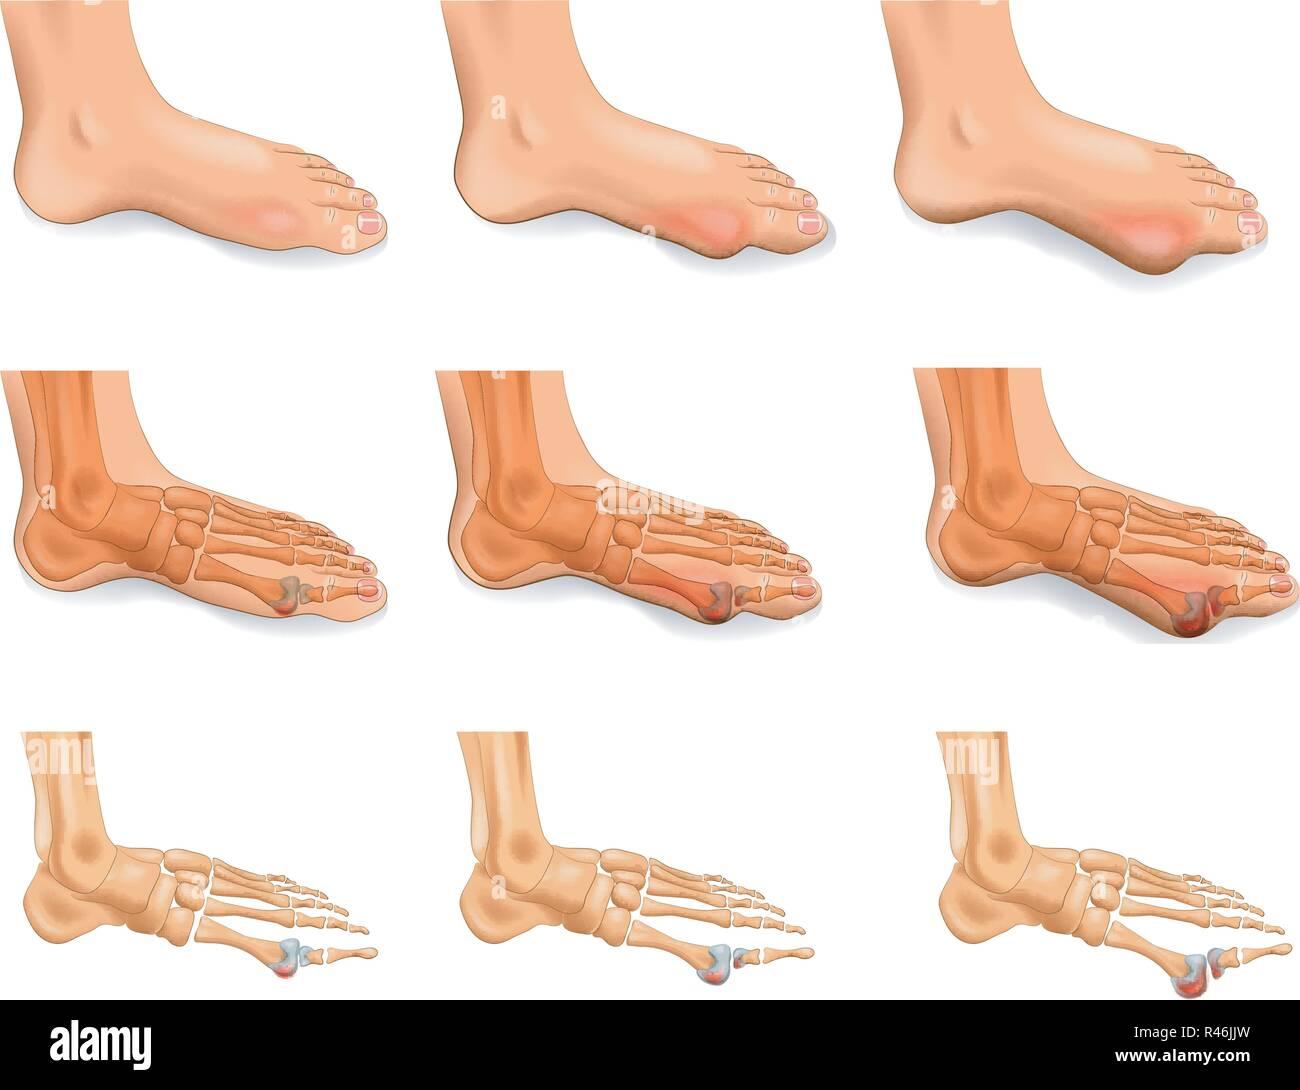 Vector Illustration von Arthritis, Arthrose der großen Zehe Stockbild